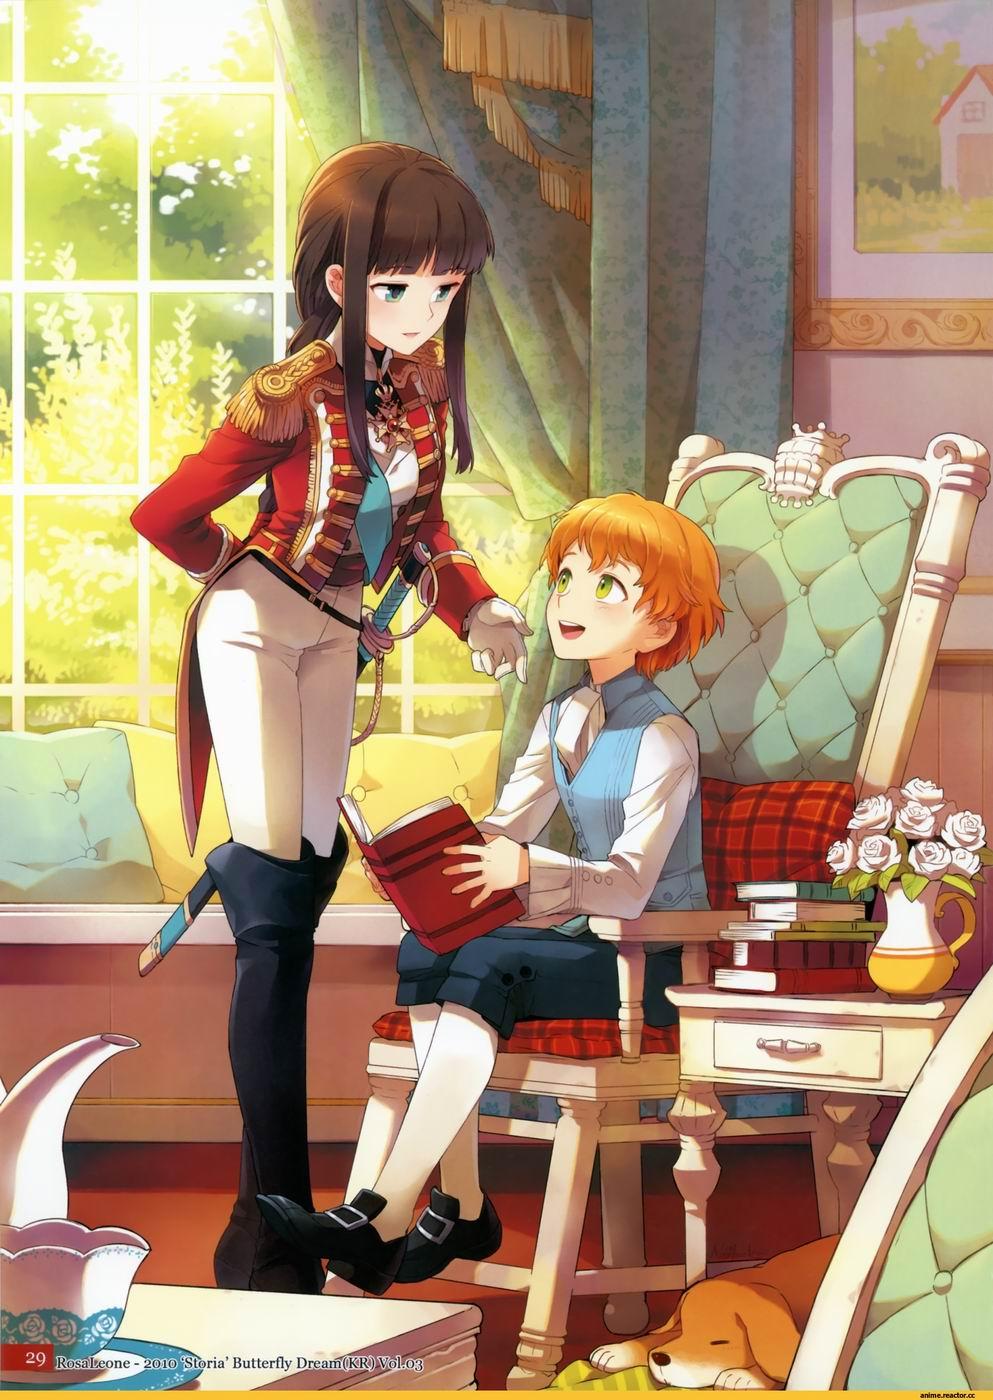 94789_Anime-Art-Anime-AO-Nardack-2130058